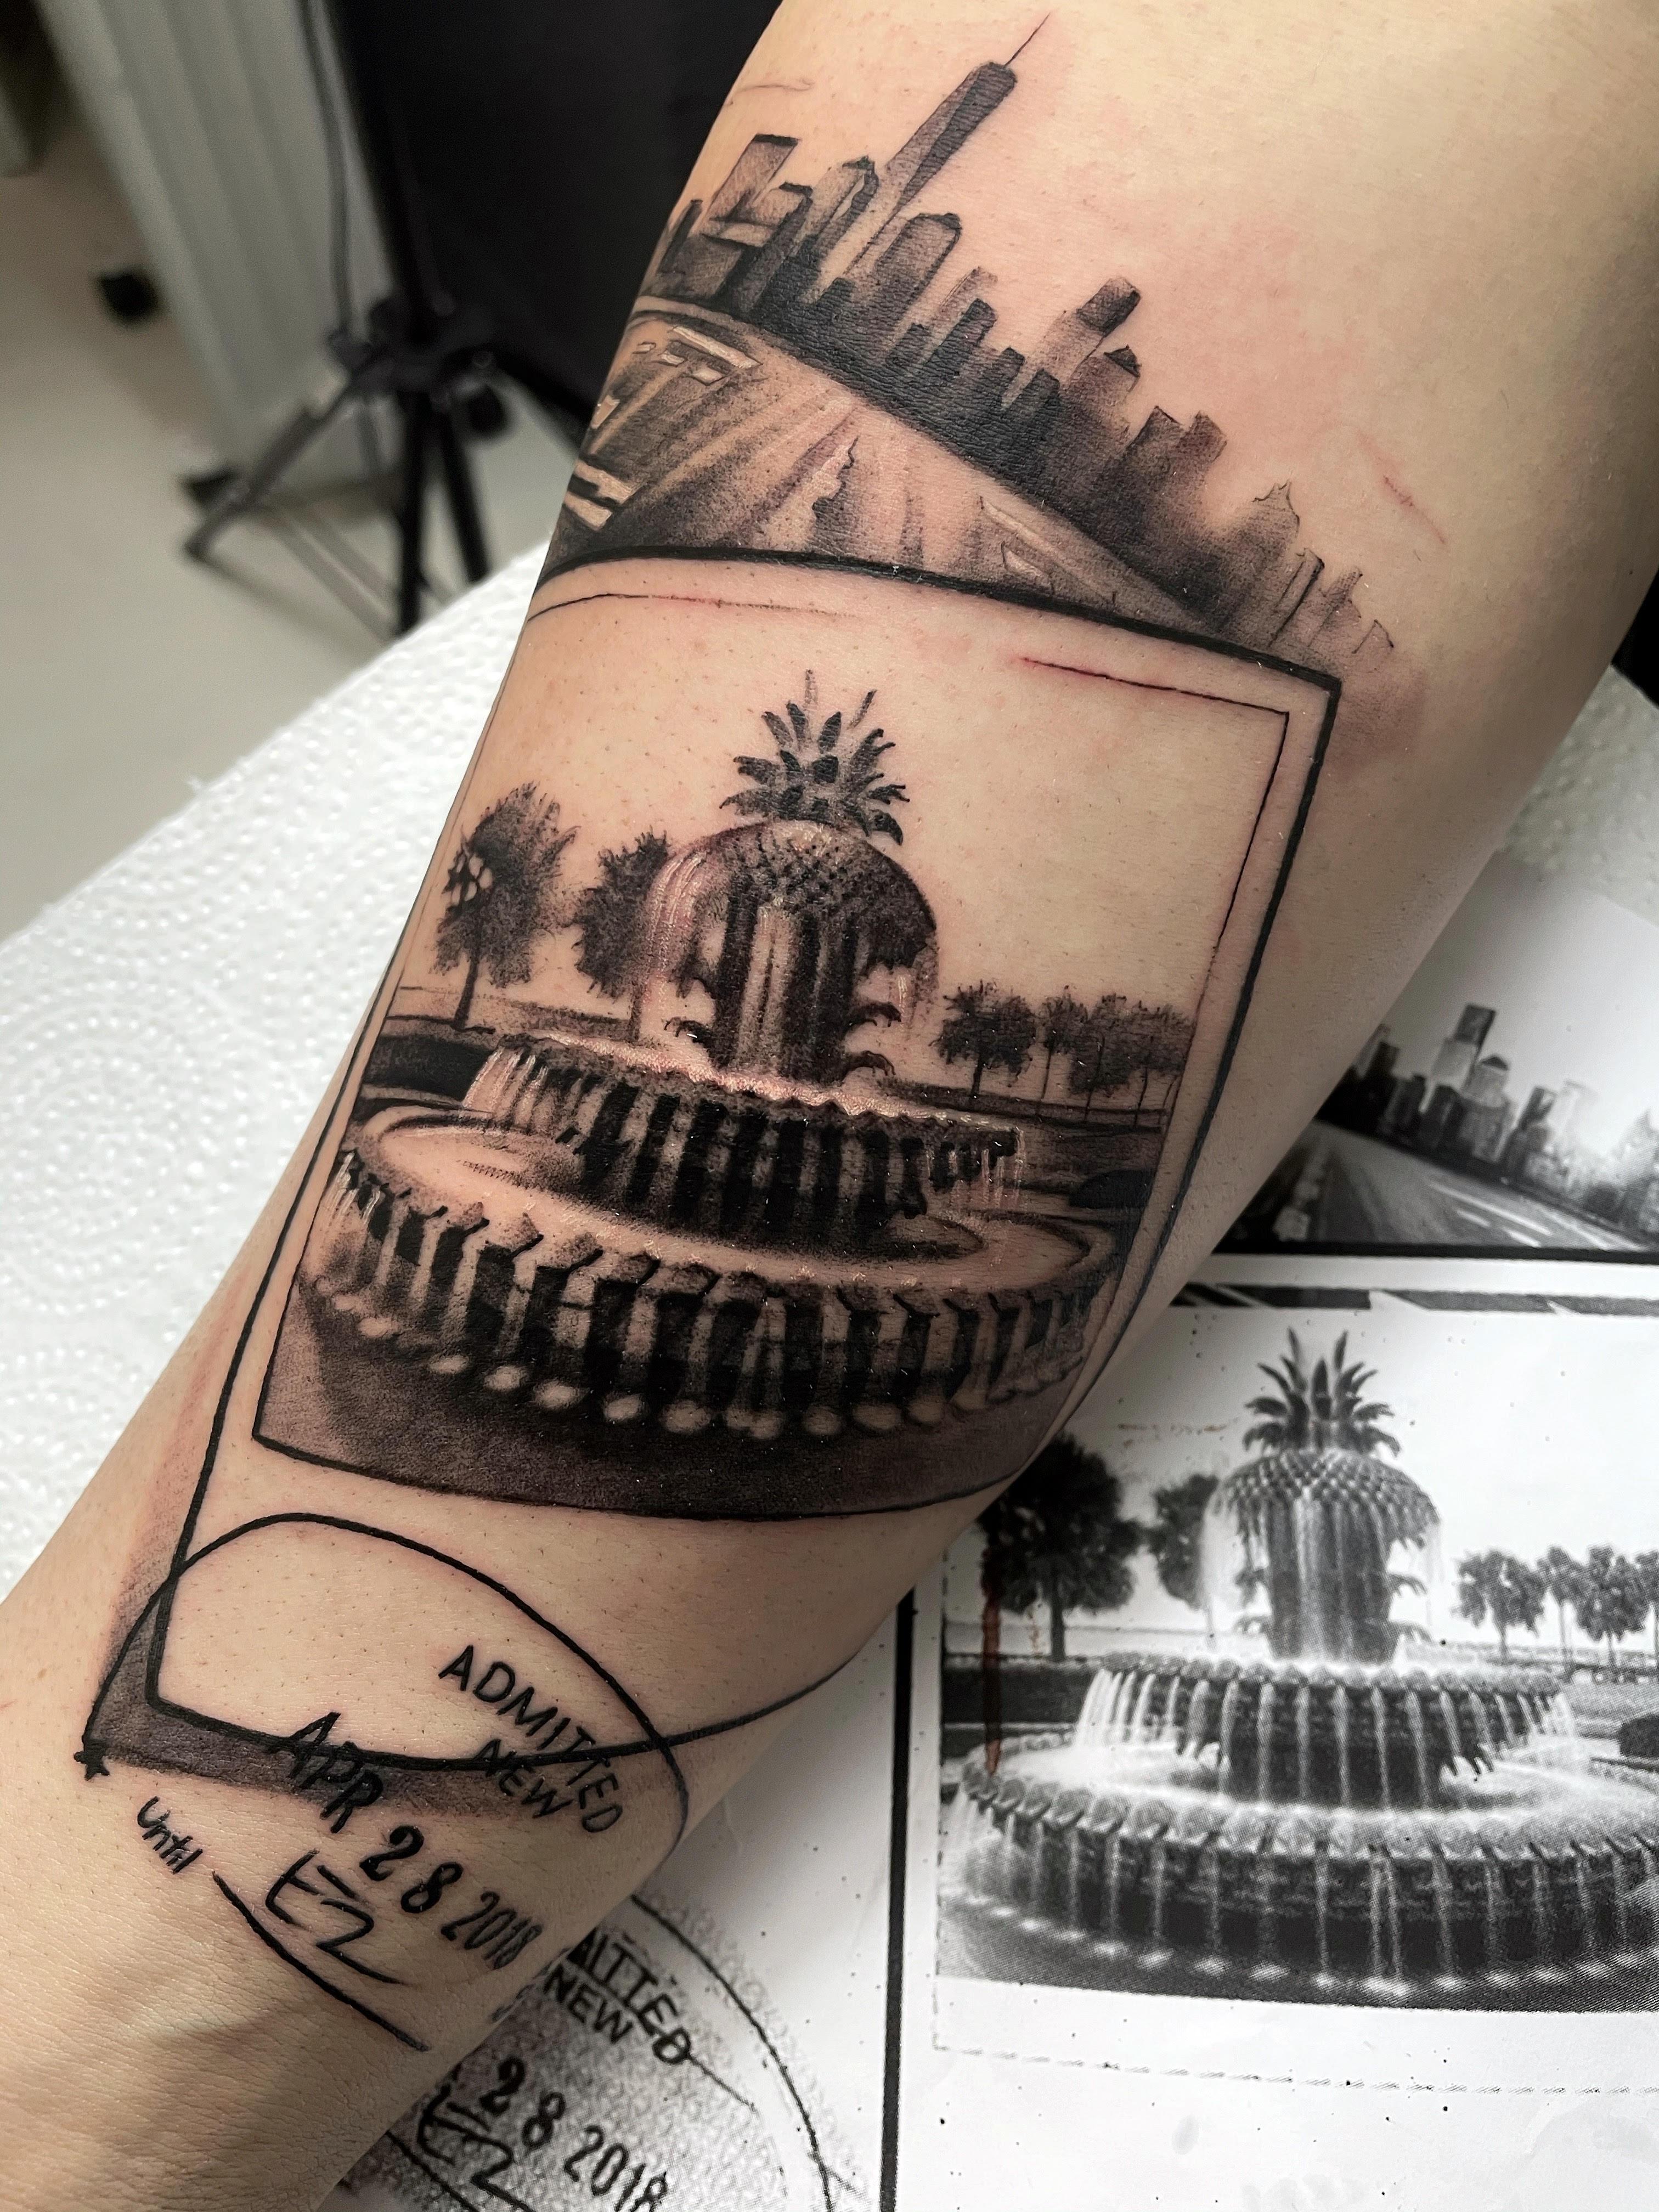 polaroid tattoo of a fountain and city